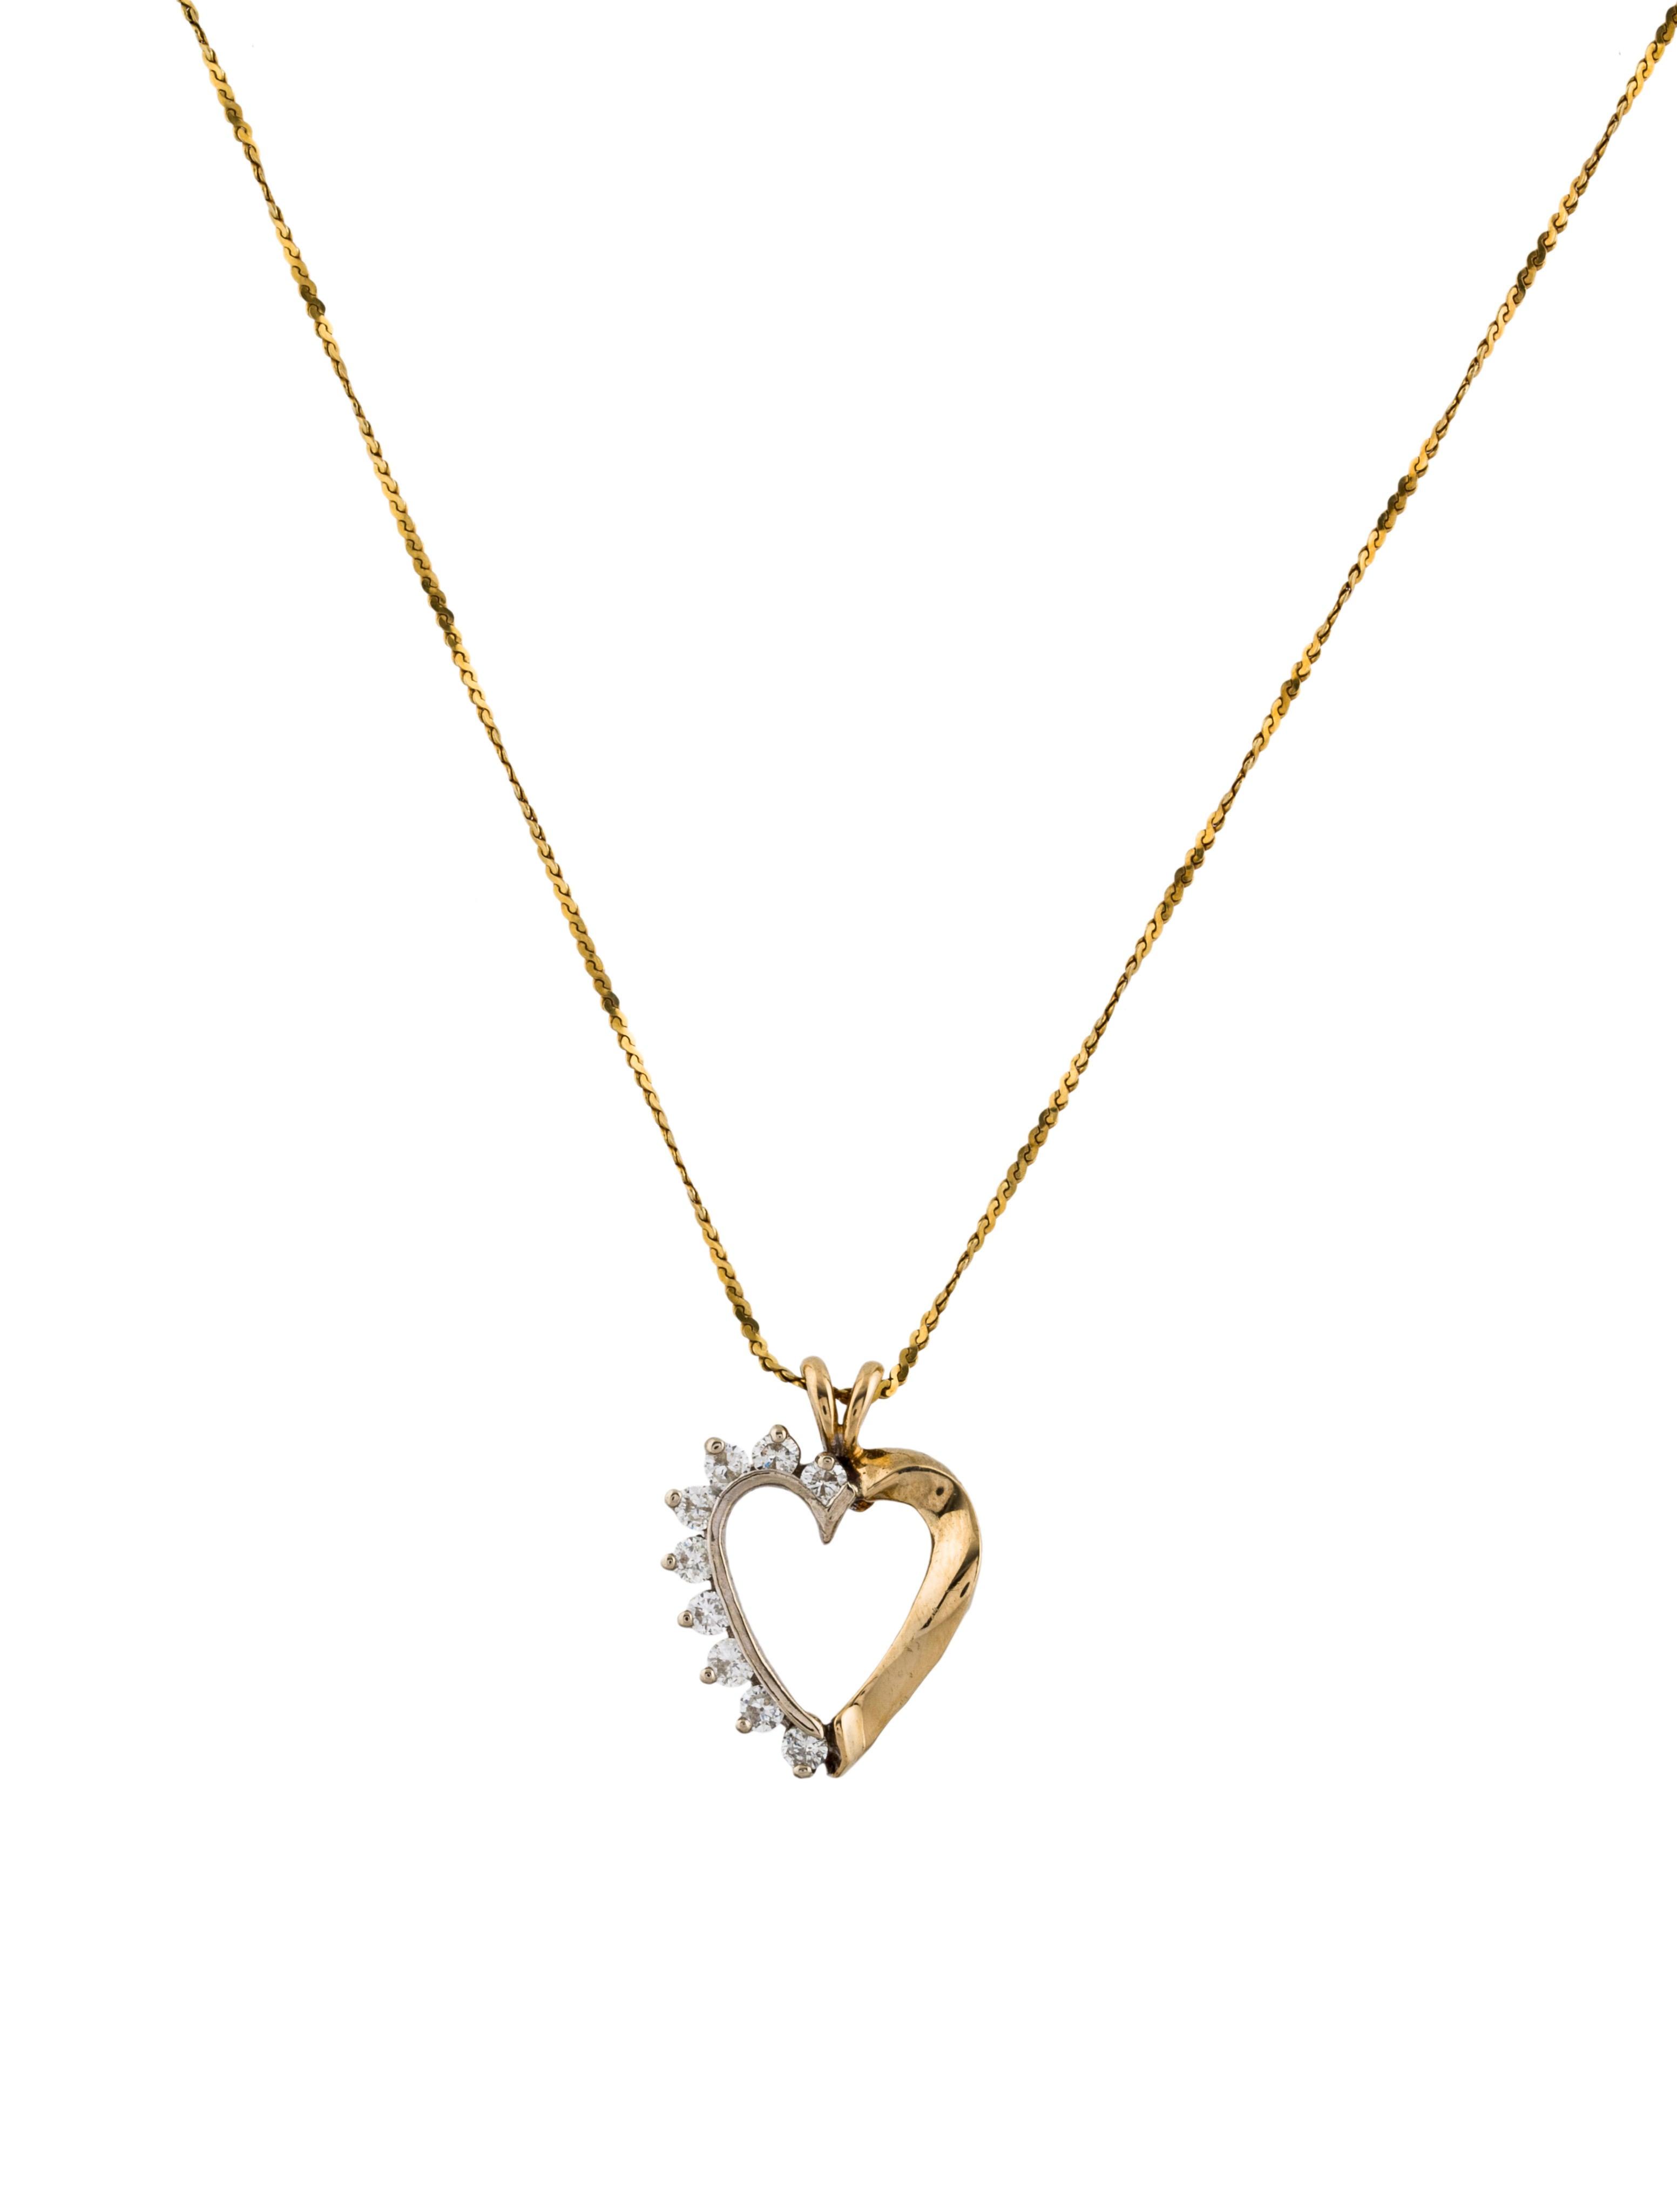 Diamond heart pendant necklace necklaces neckl43570 the realreal diamond heart pendant necklace aloadofball Choice Image